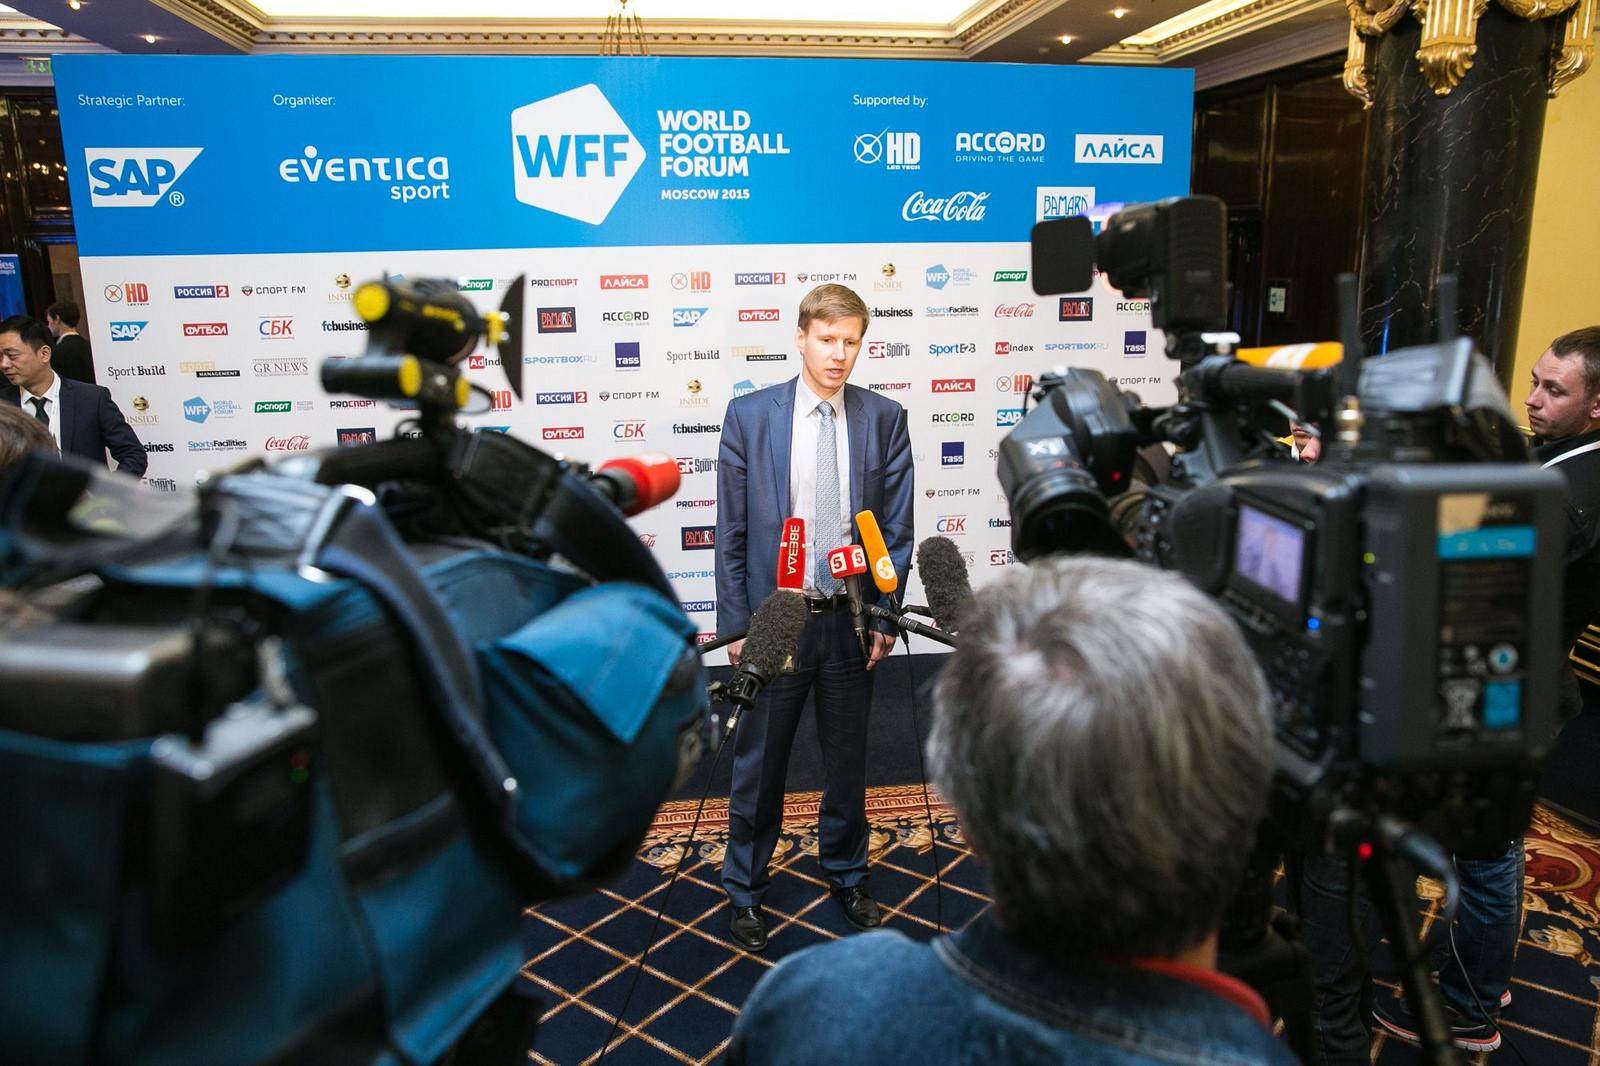 1100 Media, Journalists and Broadcast Representatives -